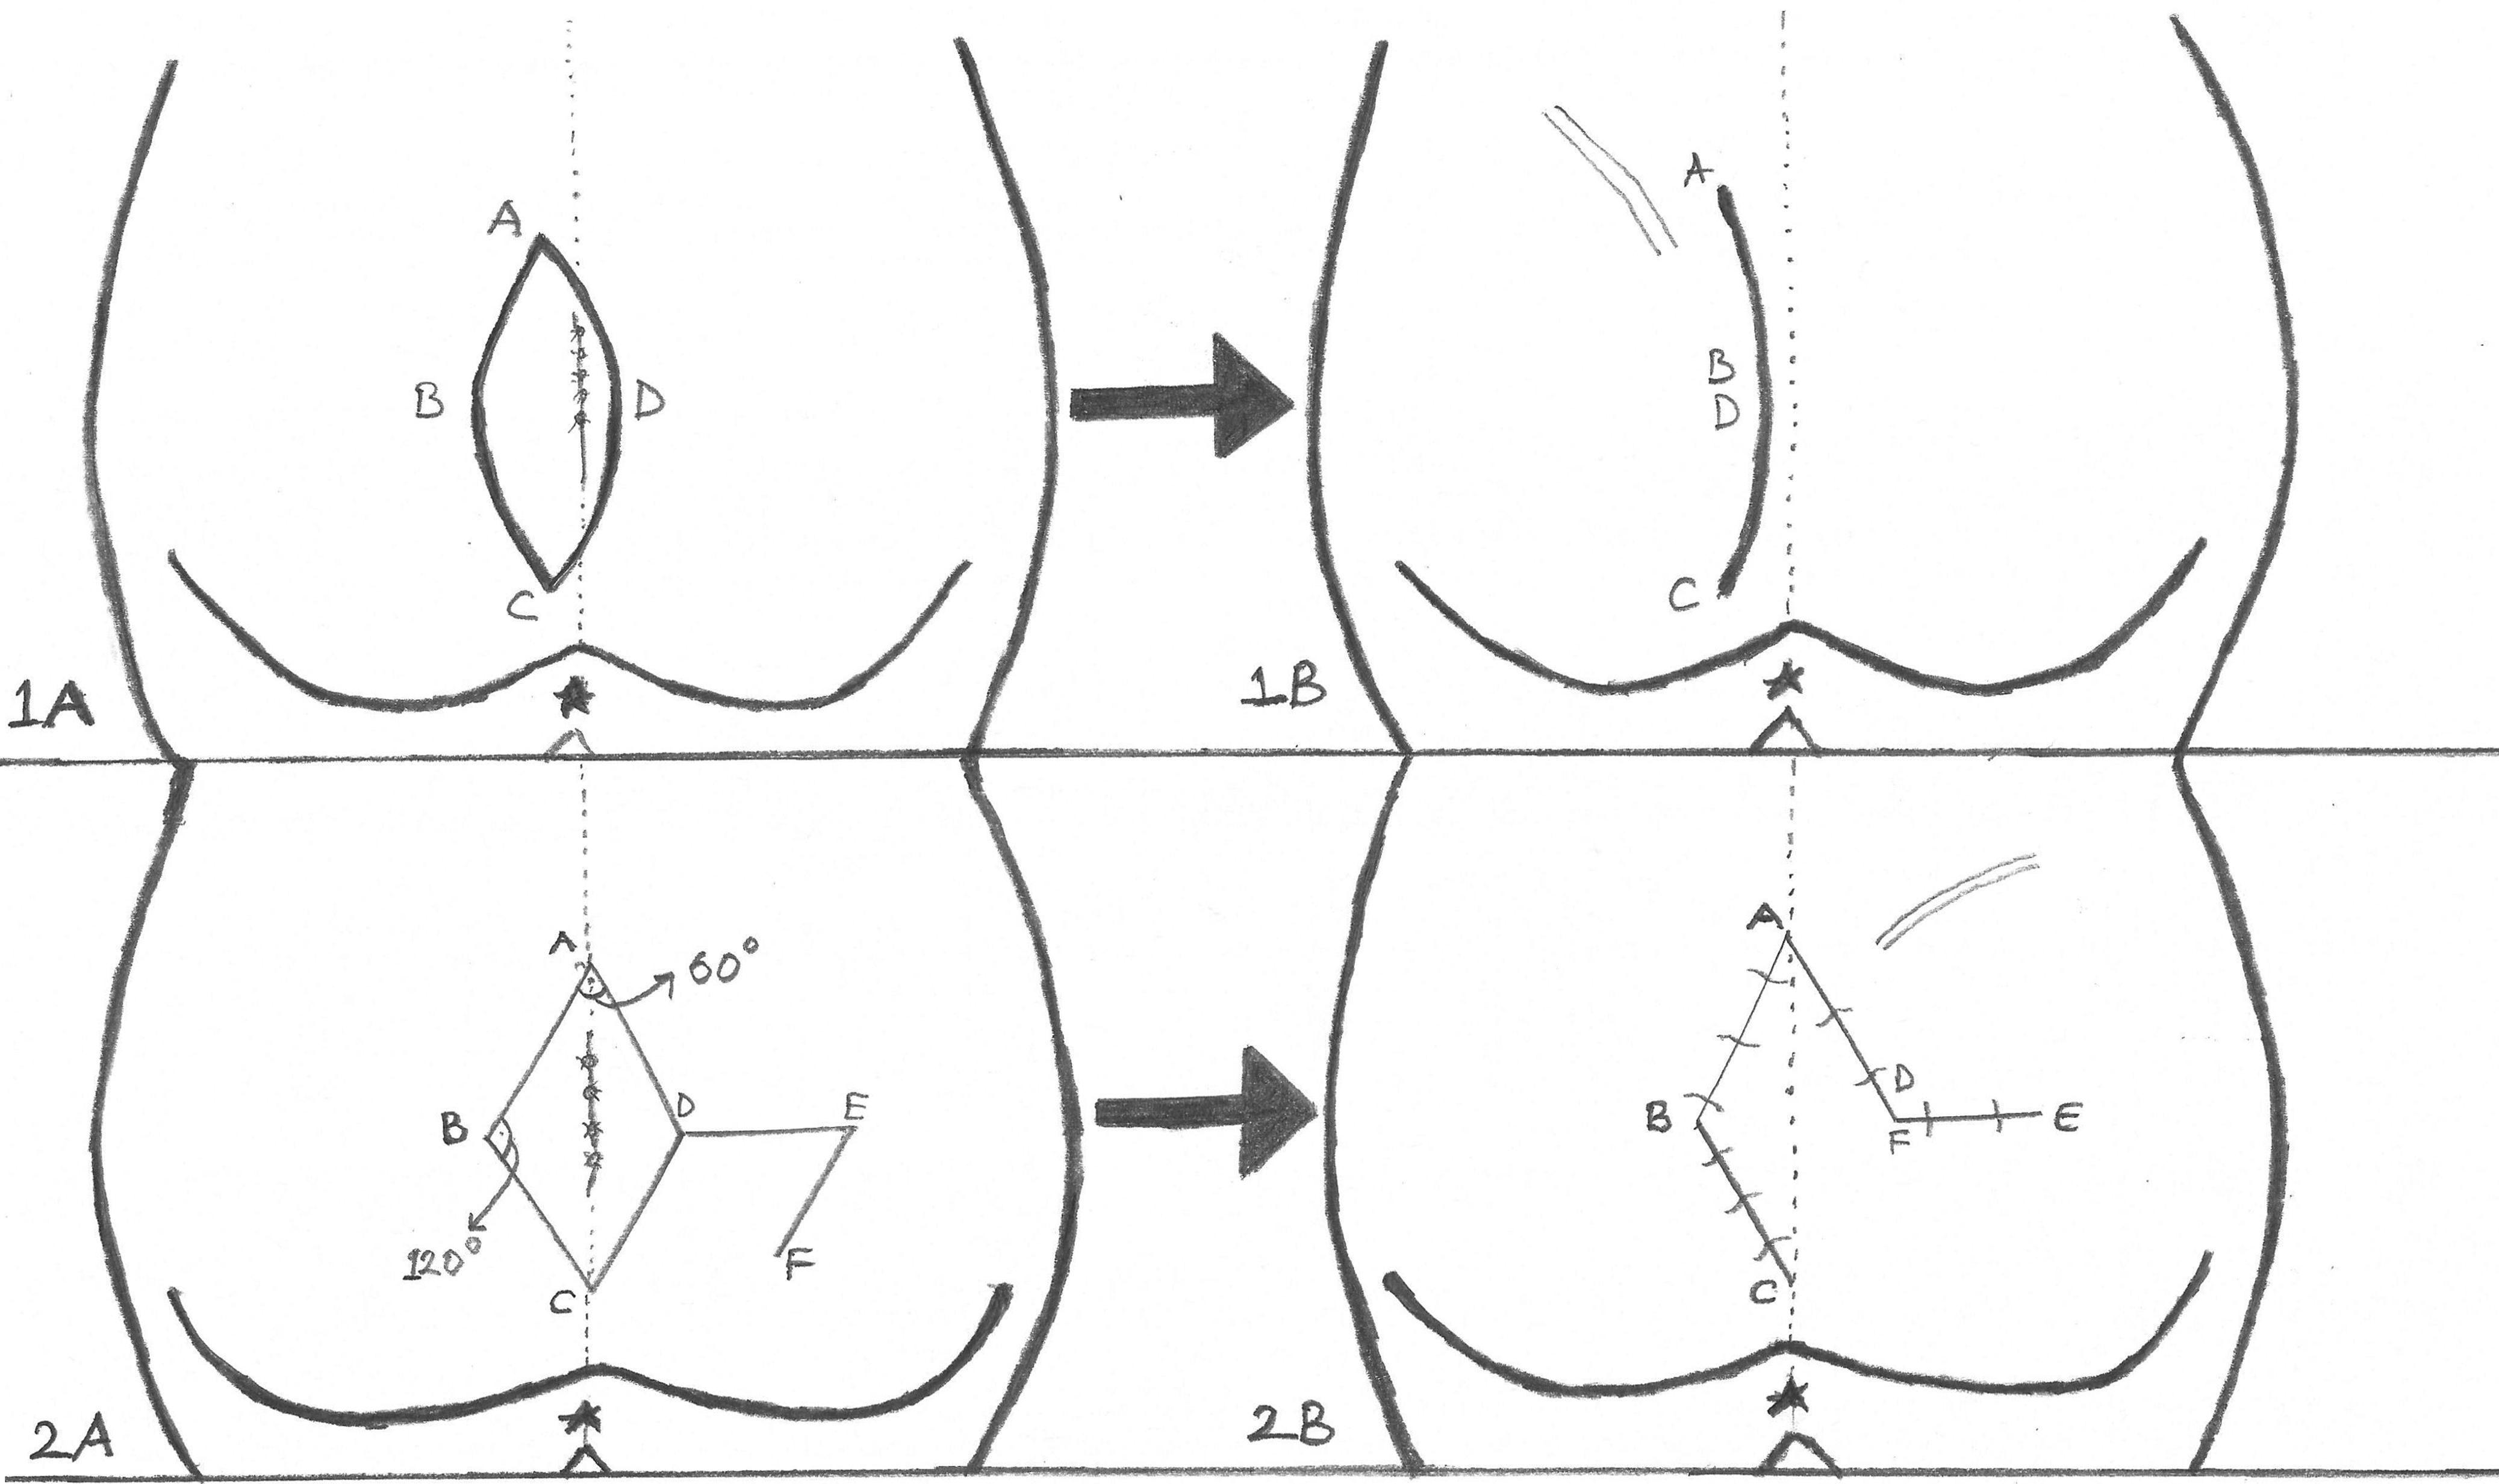 Limberg Flap Or Bascom For Pilonidal Cyst